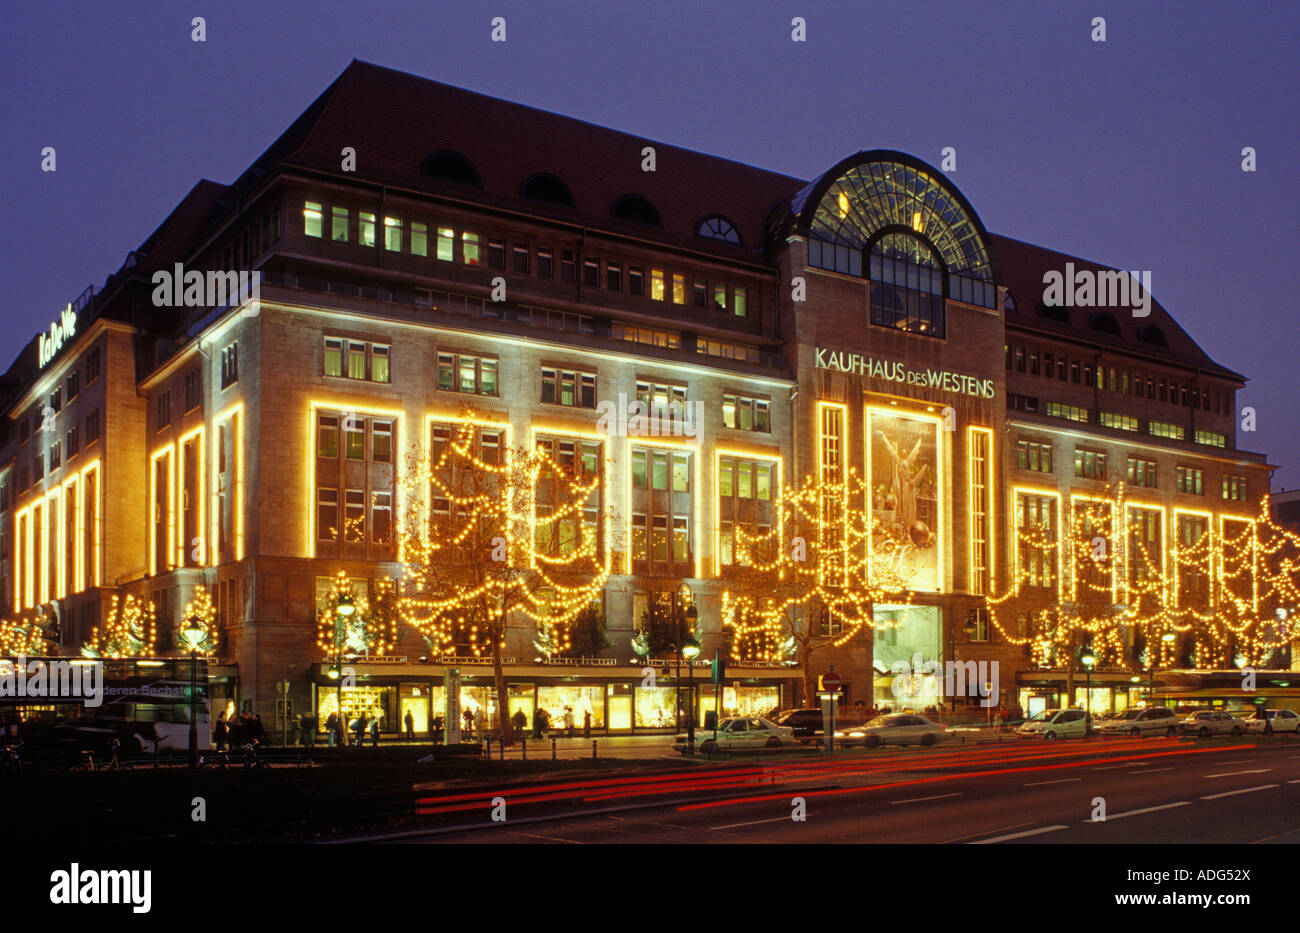 berlin kaufhaus des westens kadewe christmas time stock photo royalty free image 13411249. Black Bedroom Furniture Sets. Home Design Ideas